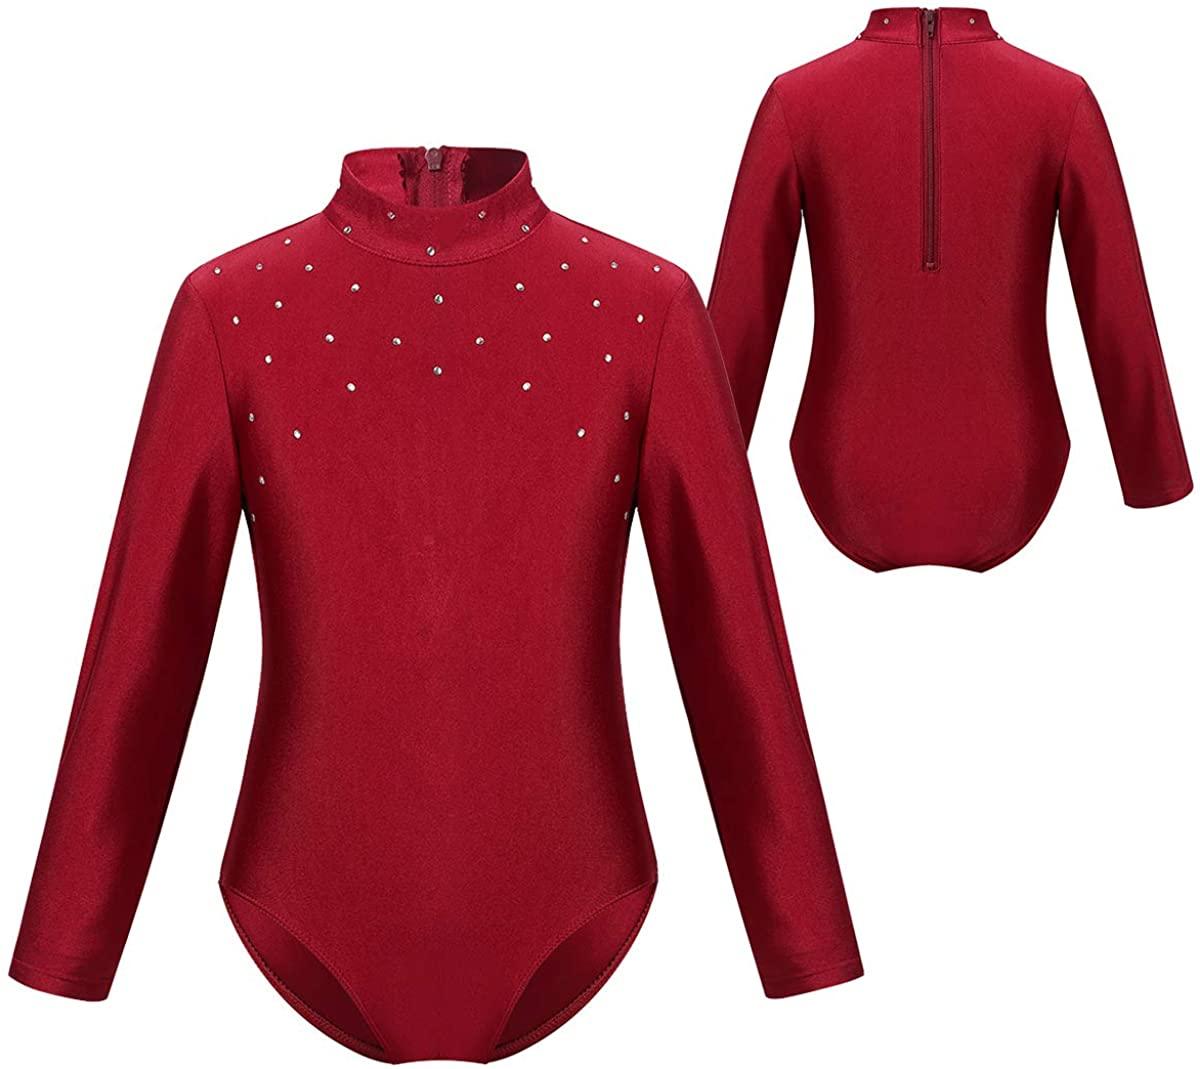 CHICTRY Big Girls' Lightweight Turtleneck Spandex Long Sleeve Leotard Gymnastics Sports Bodysuit with Rhinestones